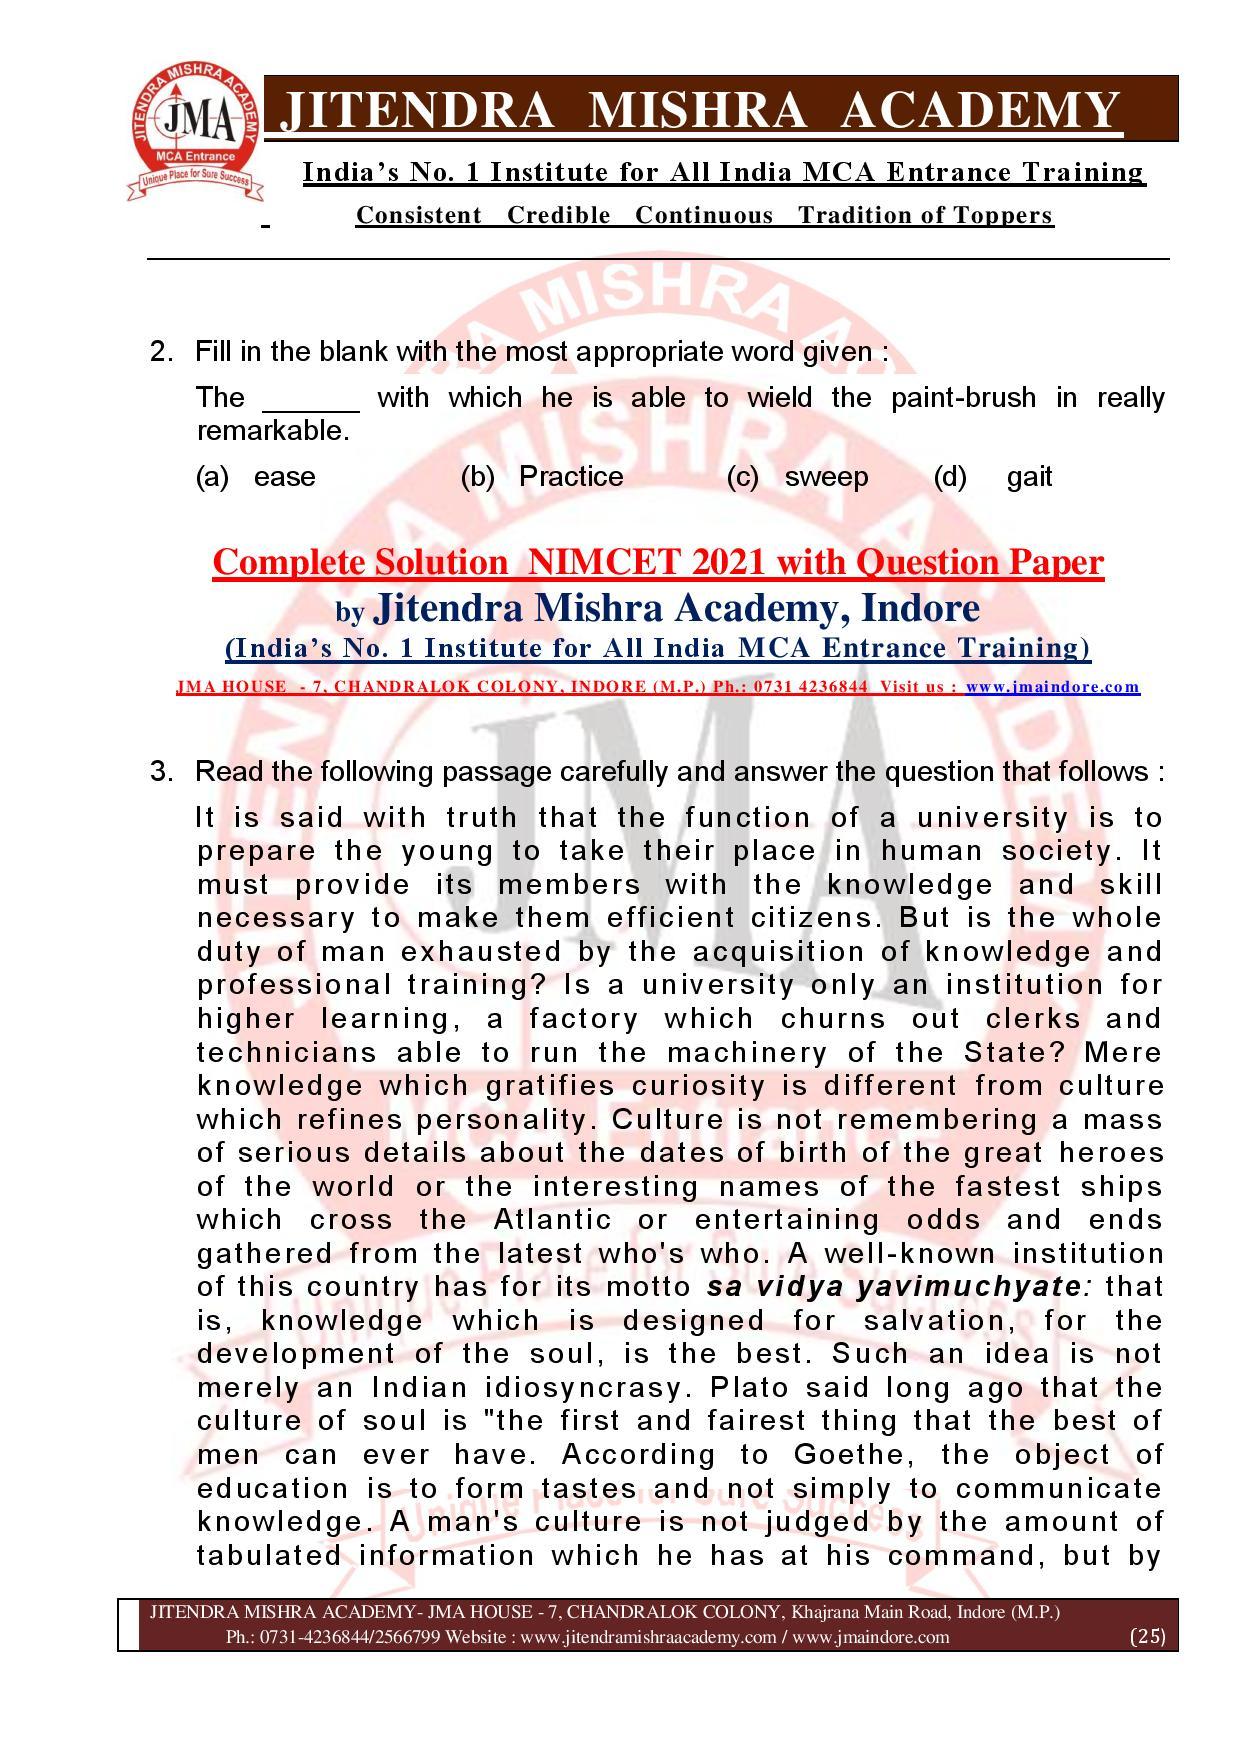 NIMCET 2021 QUESTION PAPER (F)-page-025